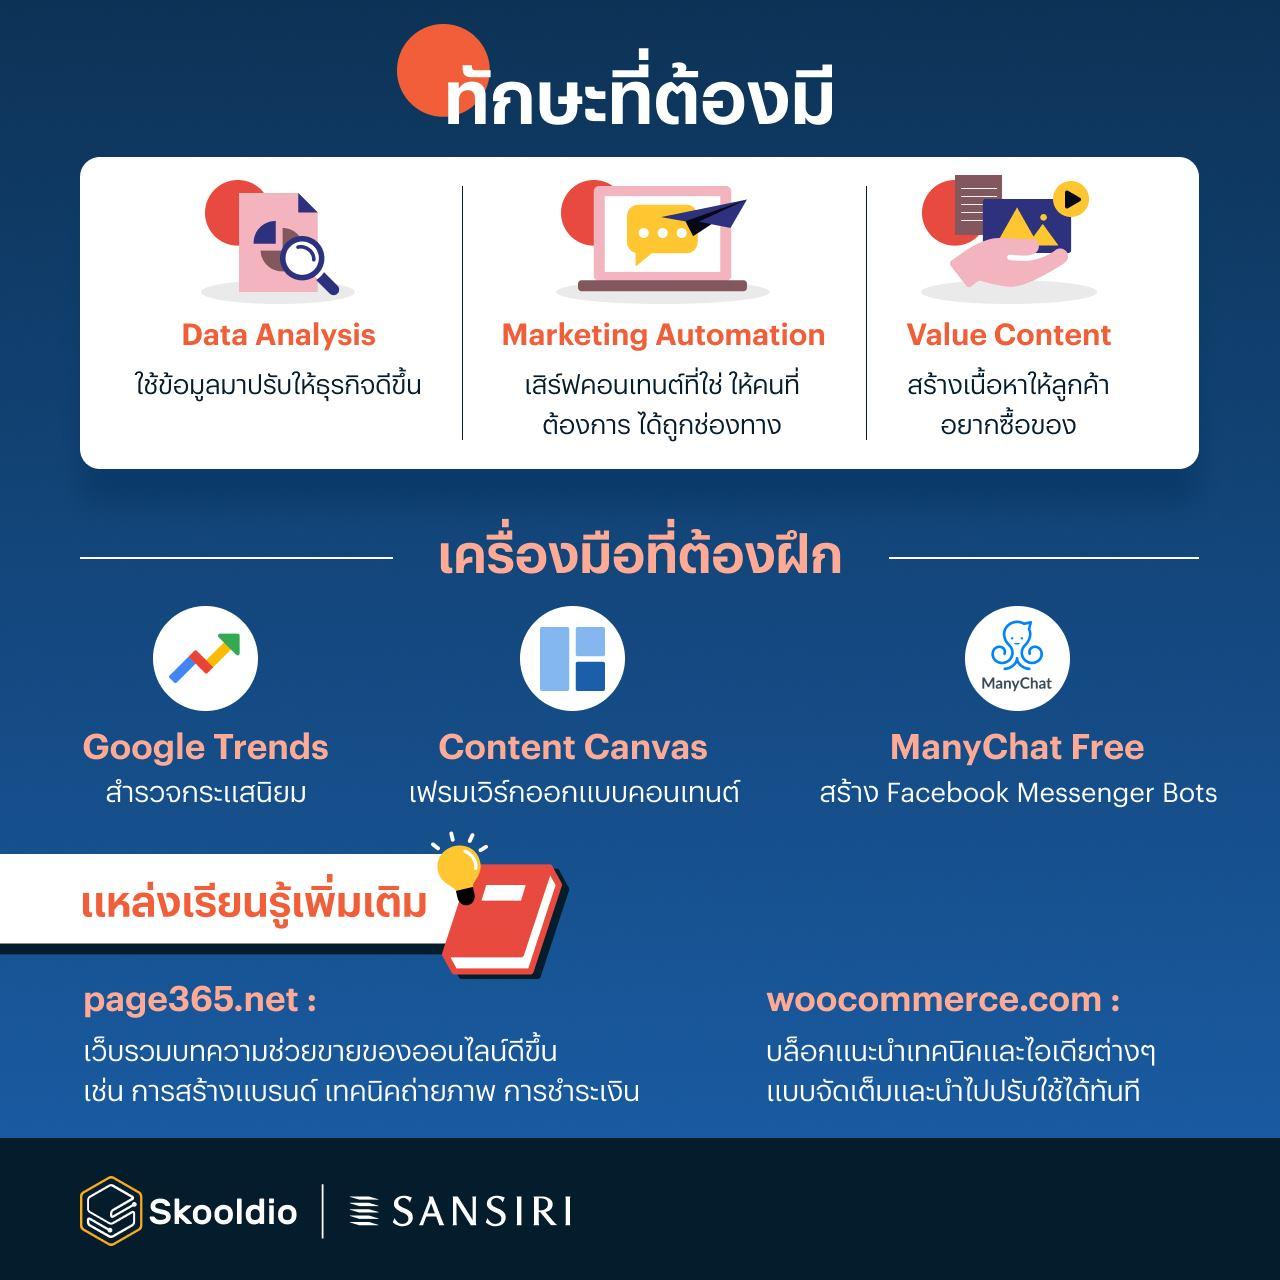 e-commerce skooldio sansiri made for future